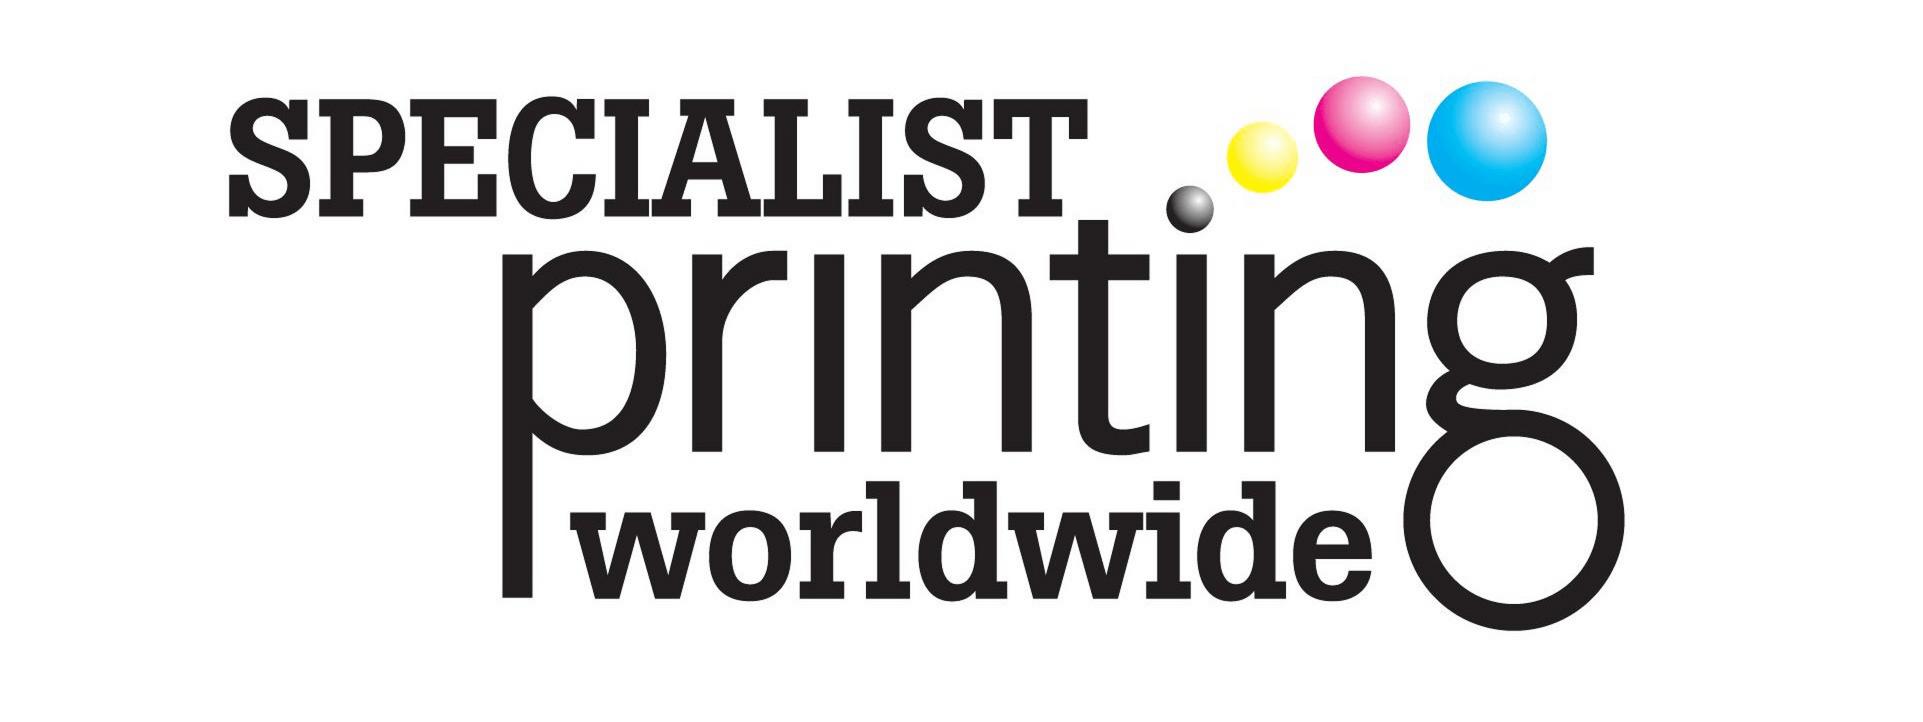 Specialist-Printing-worldwide.jpg.png